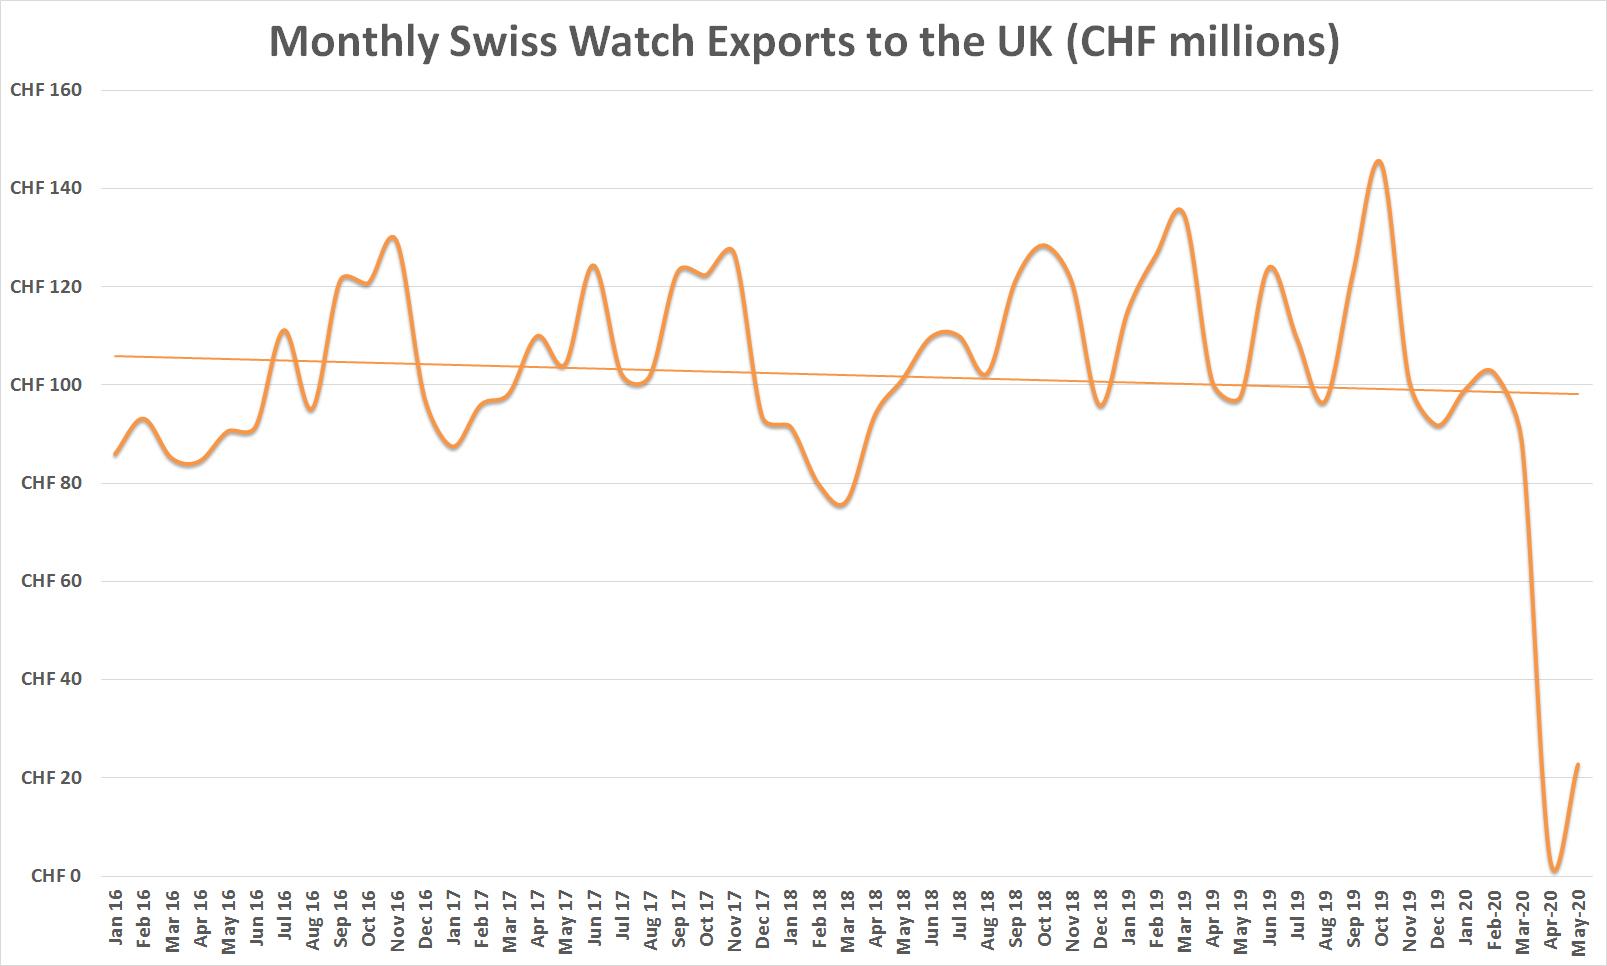 Swiss watch exports monthly – UK